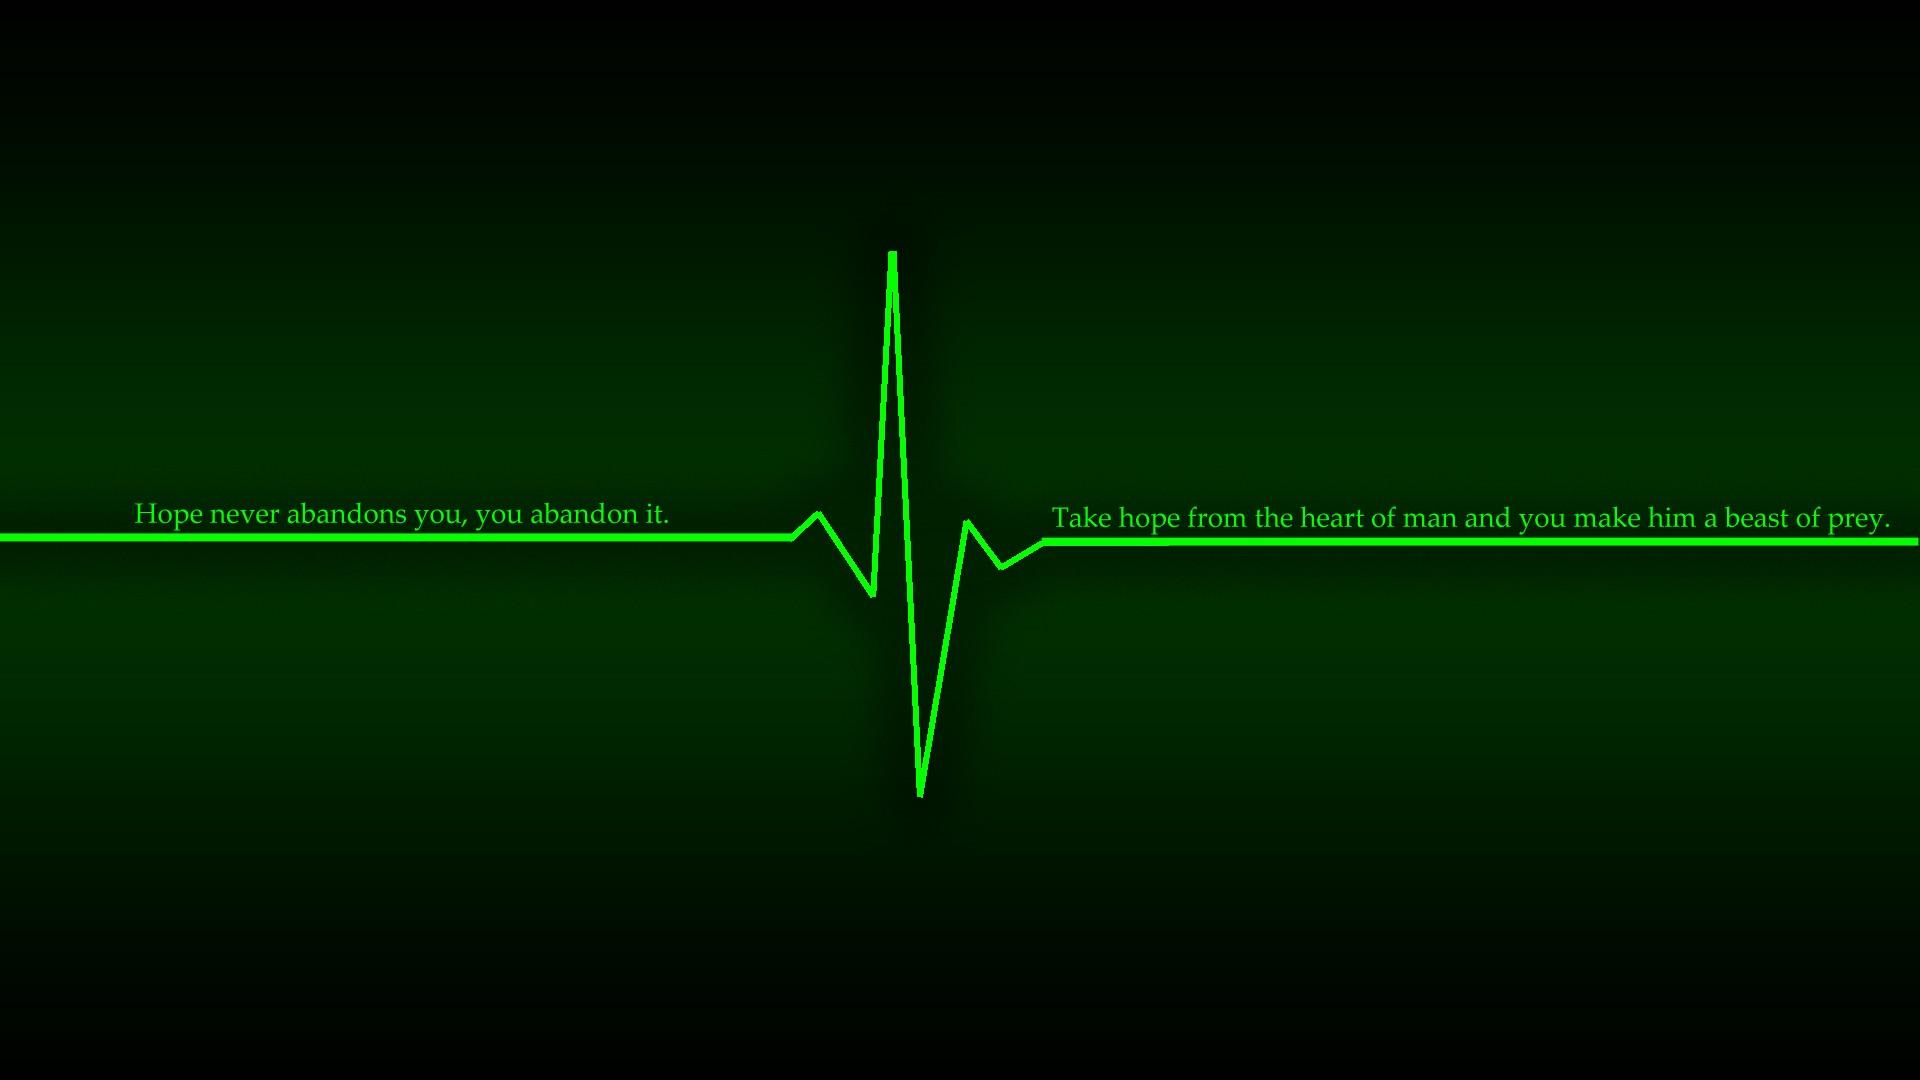 Green Dark Wallpaper 1920x1080 Green Dark Quotes Hope Heart Beat 1920x1080